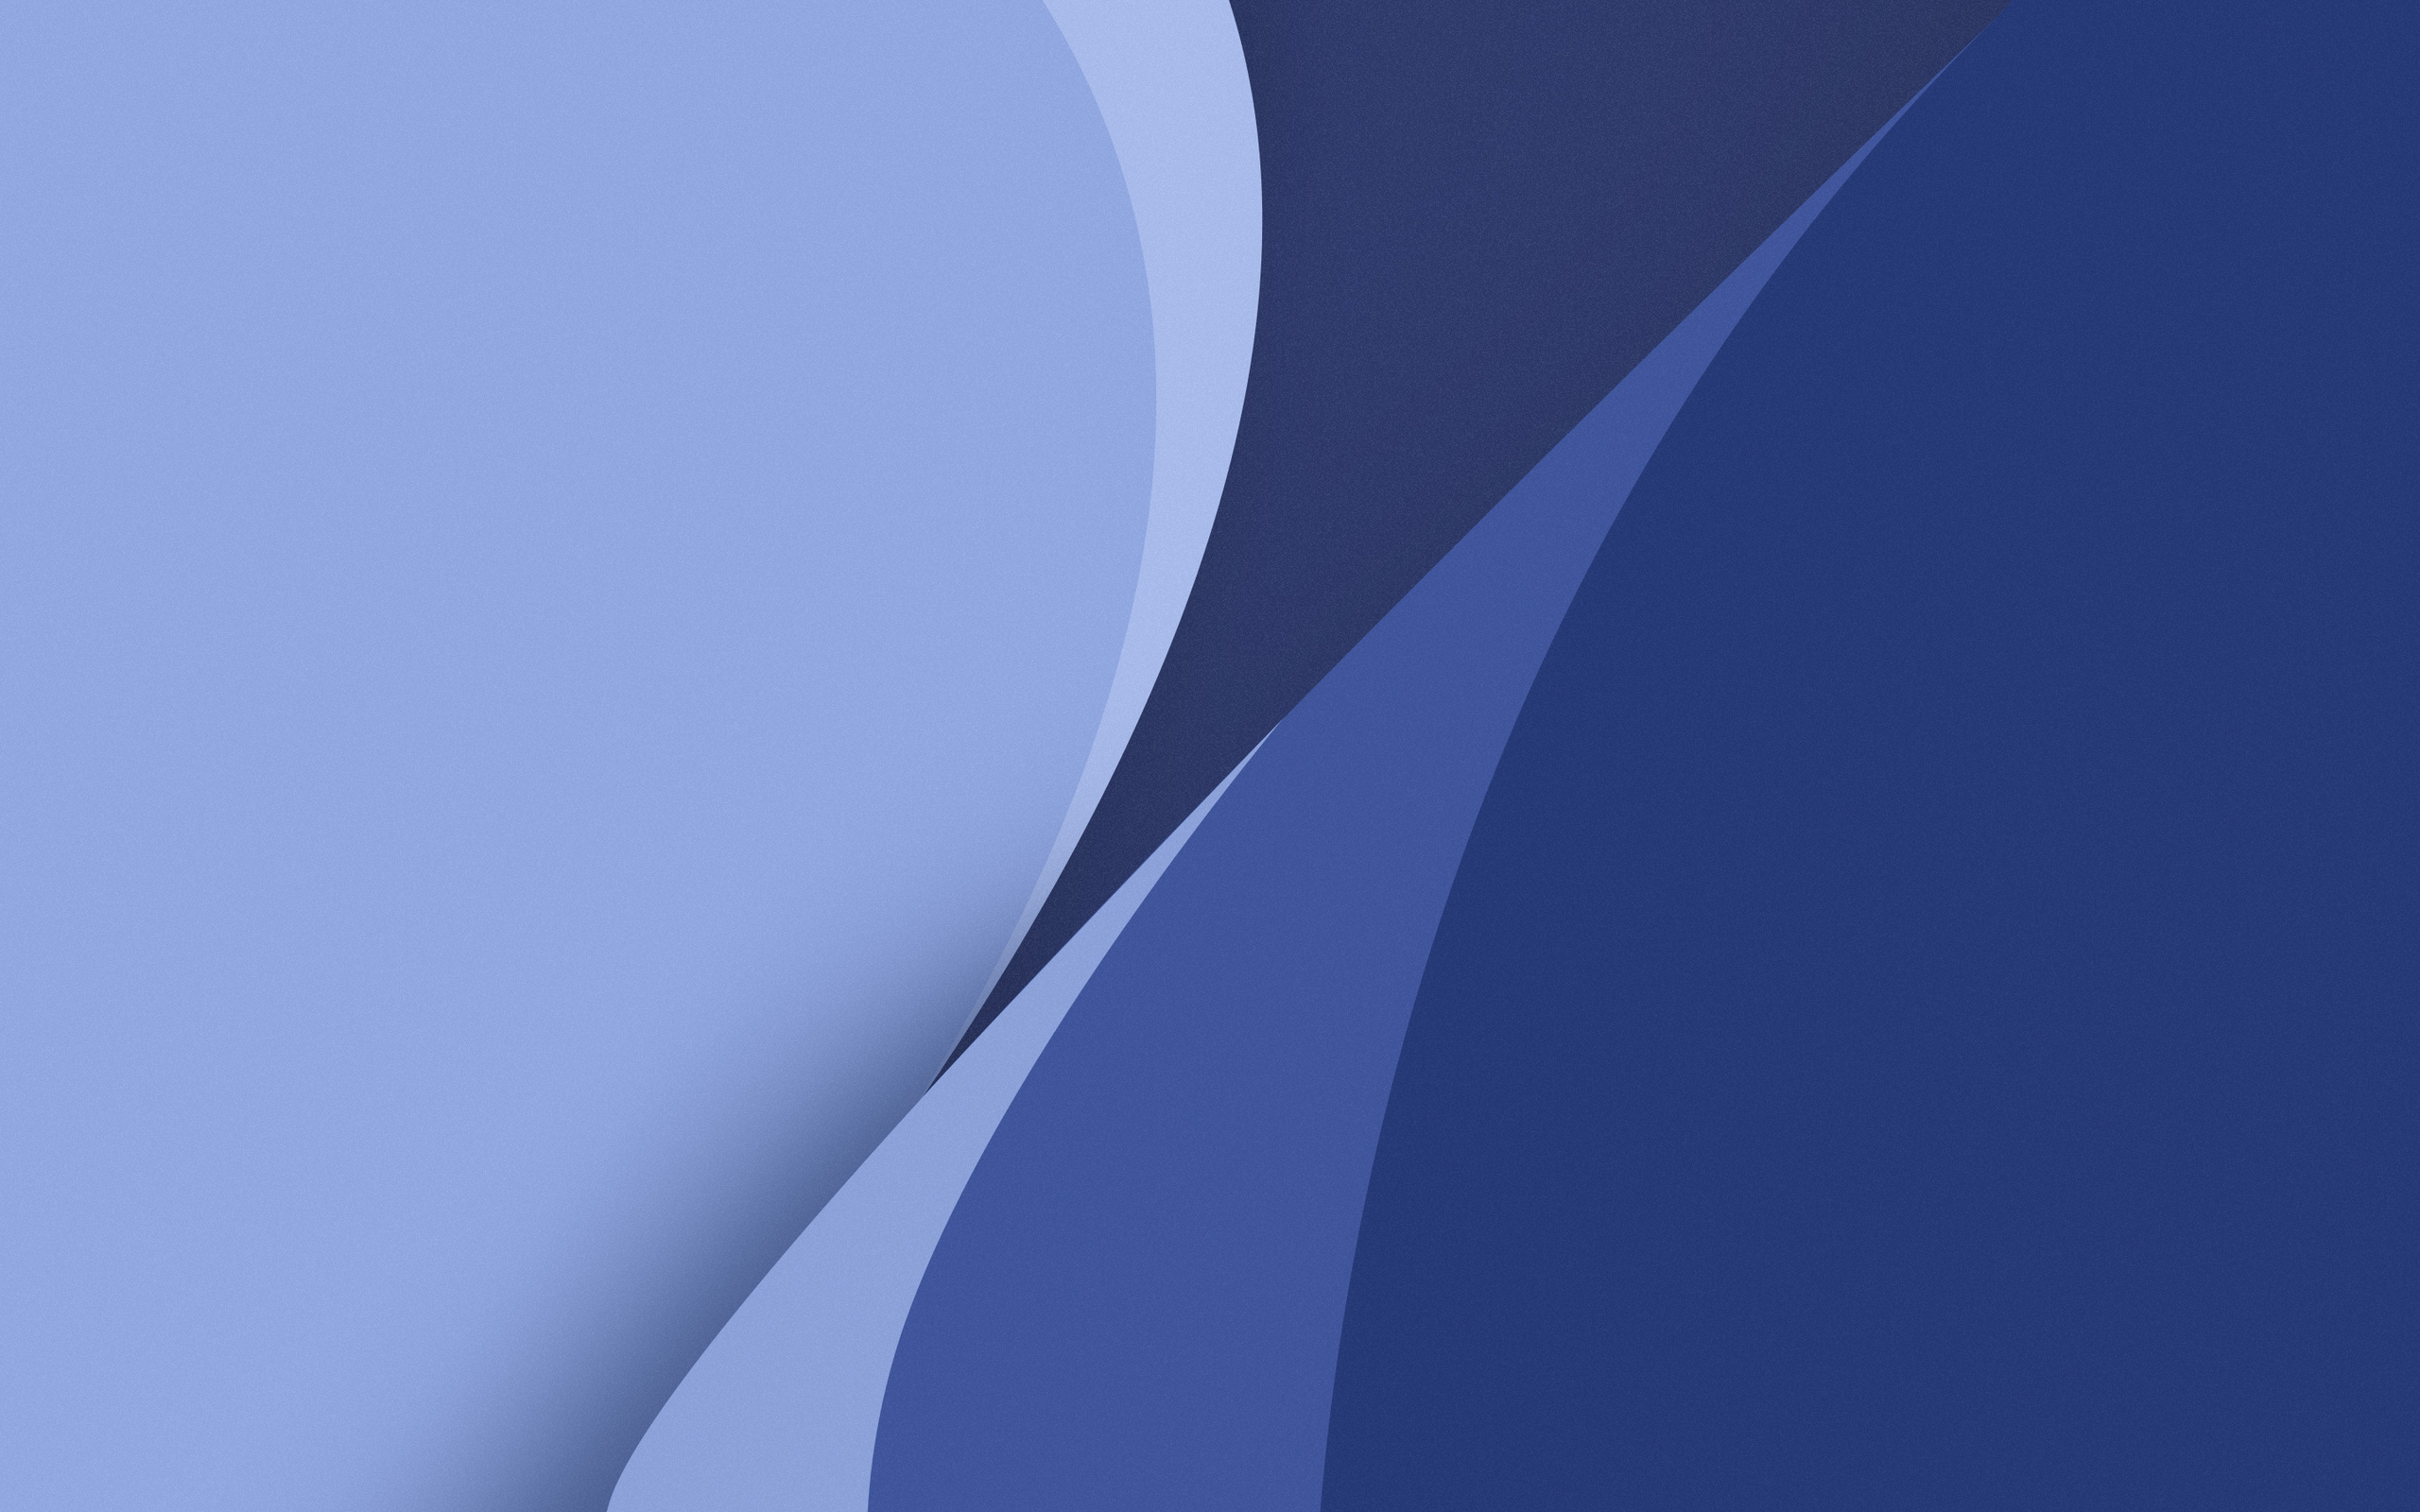 Картинка: Изгибы, линии, углы, цвет, голубой, синий, оттенок